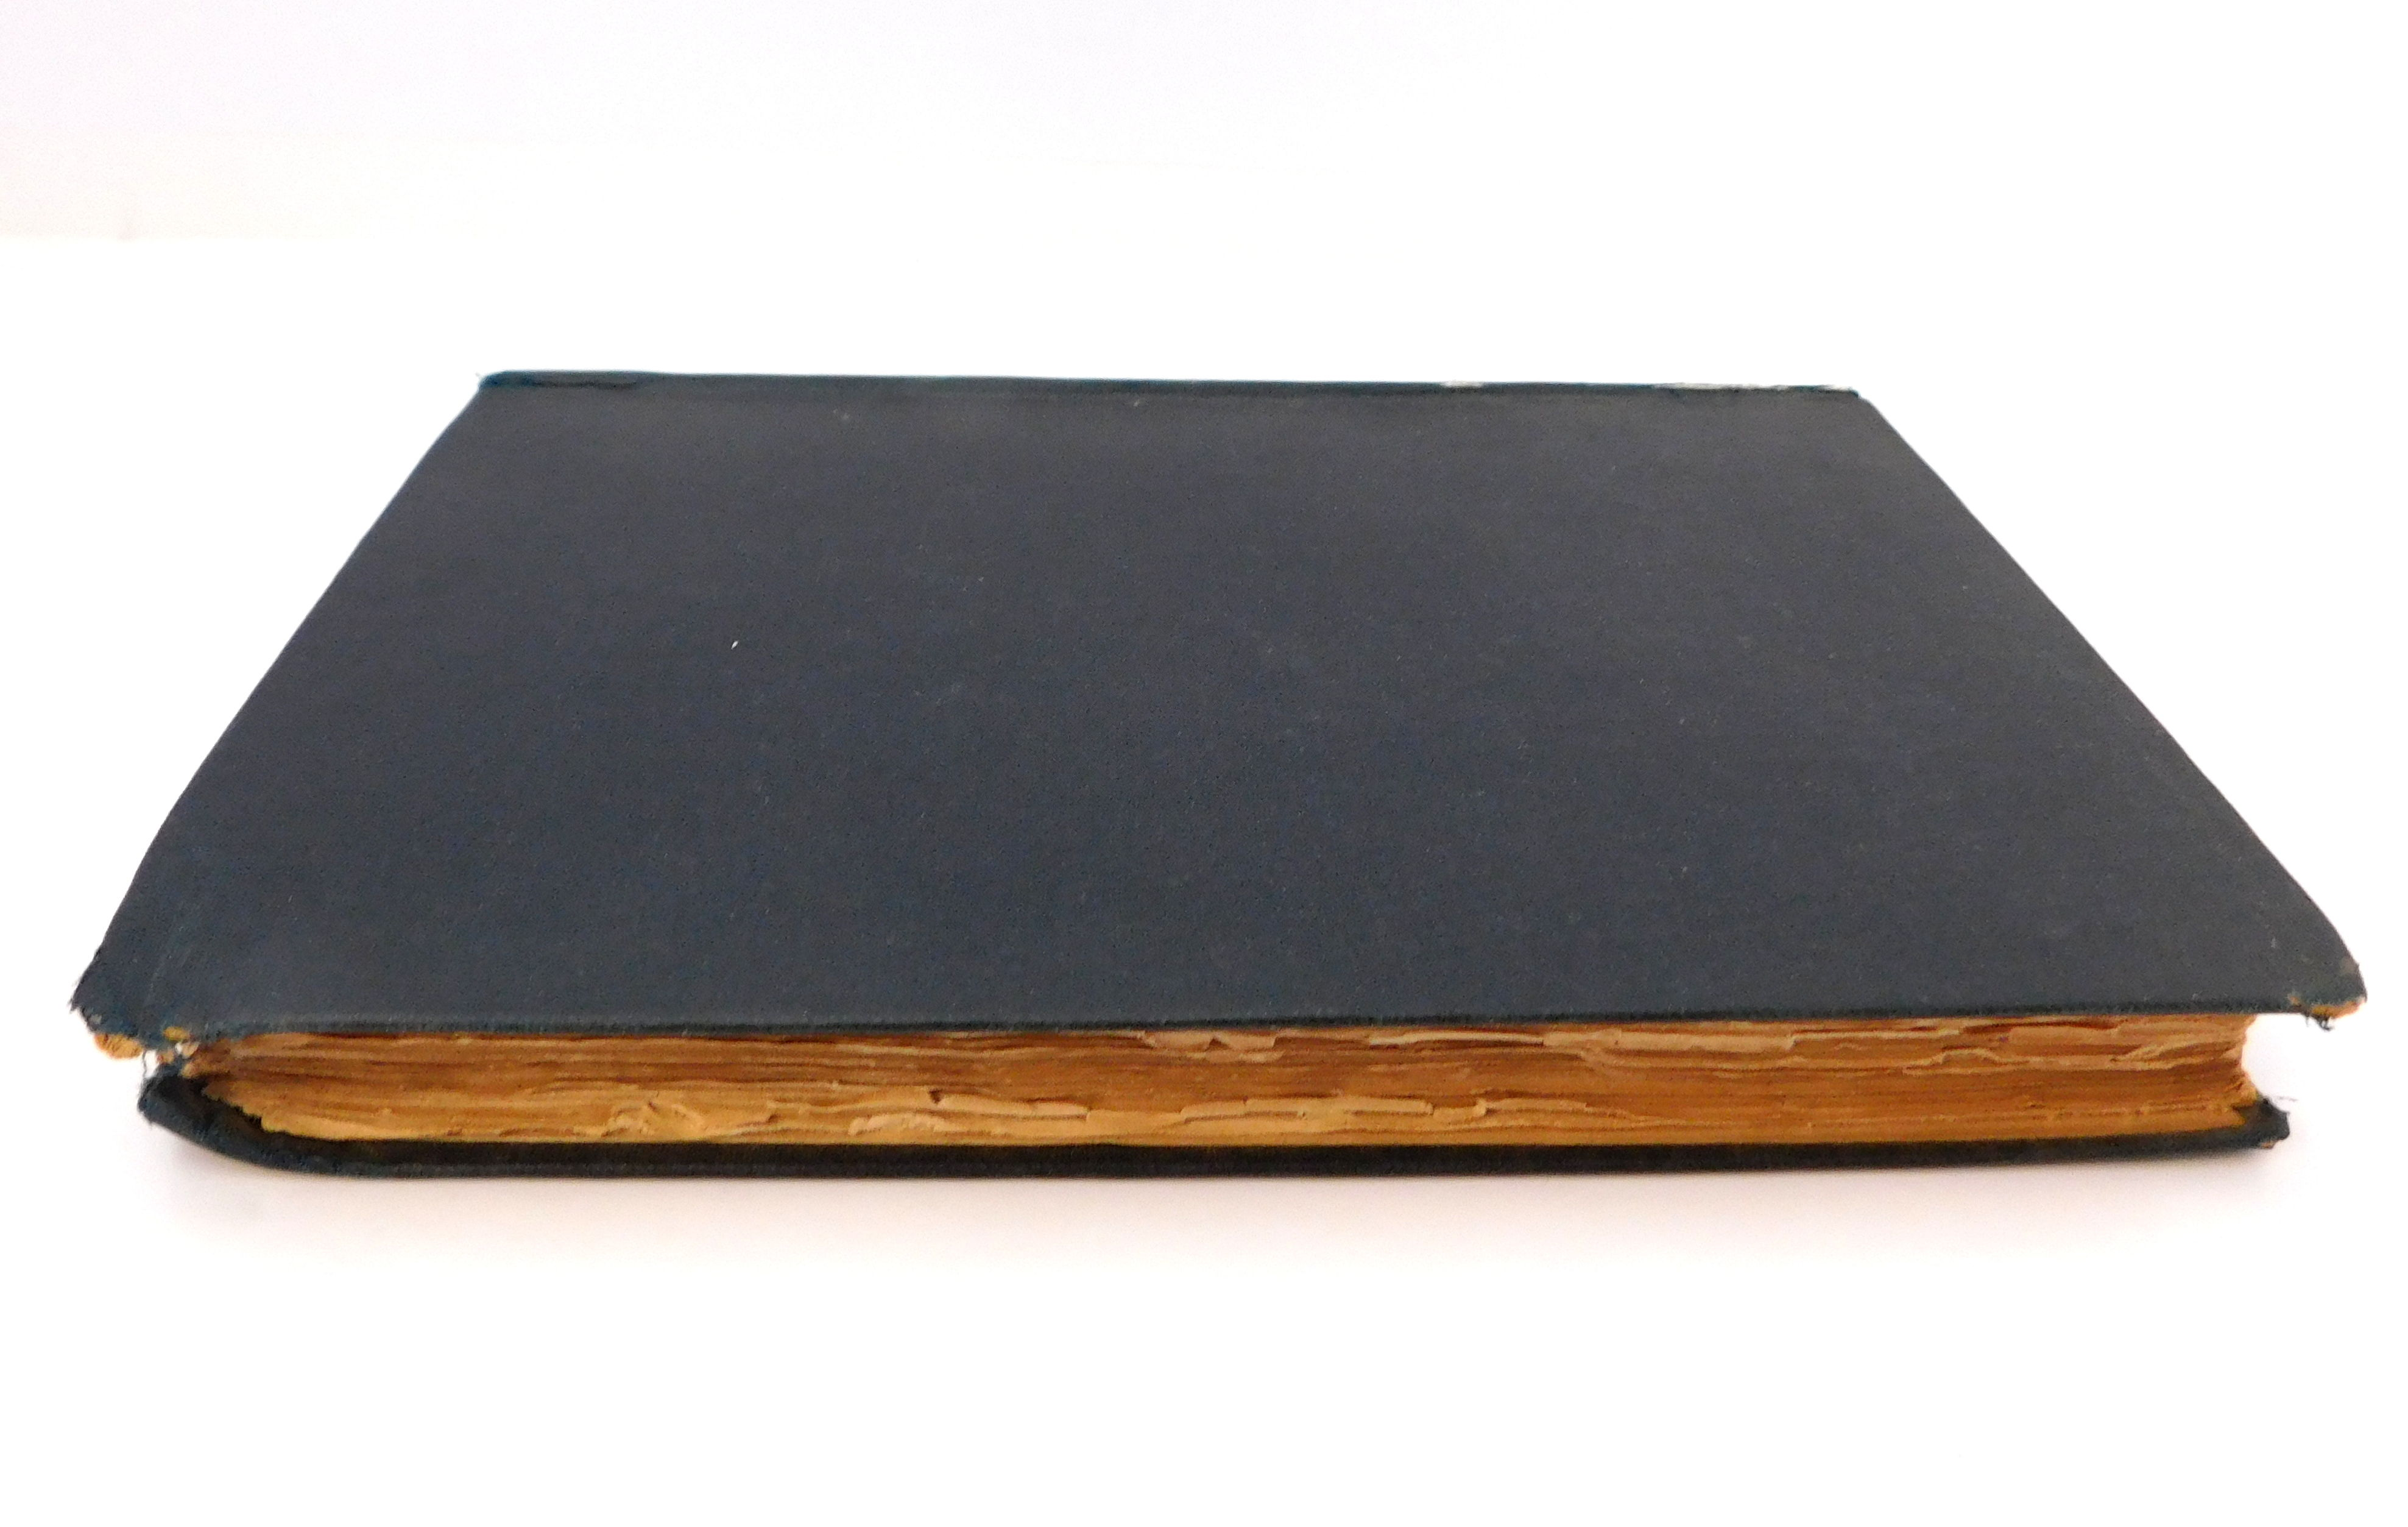 Carpenter world thesis